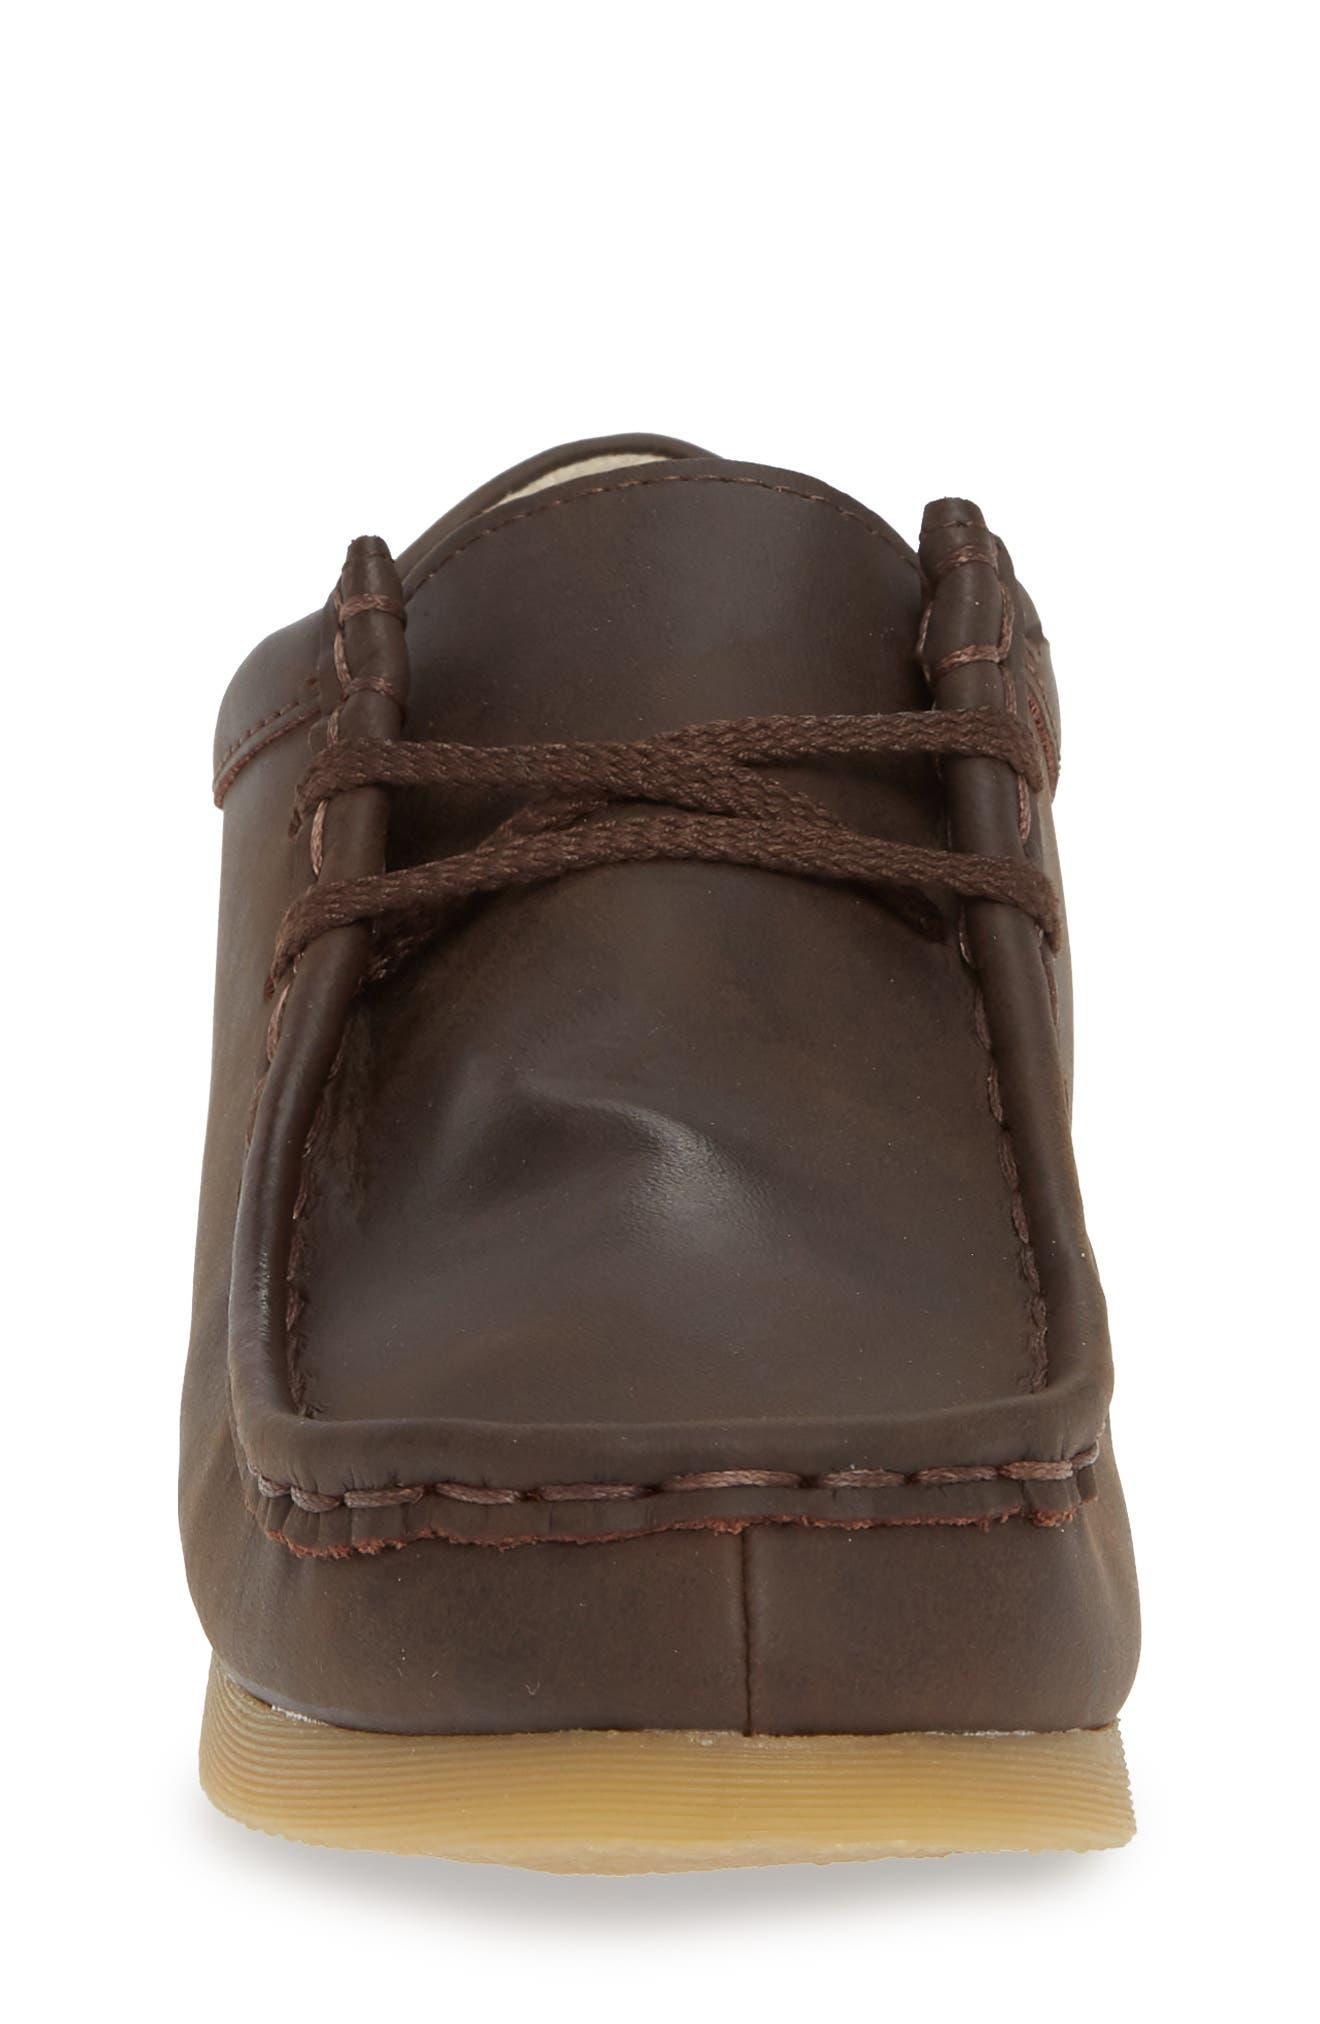 FOOTMATES, Wally Low Chukka Boot, Alternate thumbnail 4, color, BROWN OILED